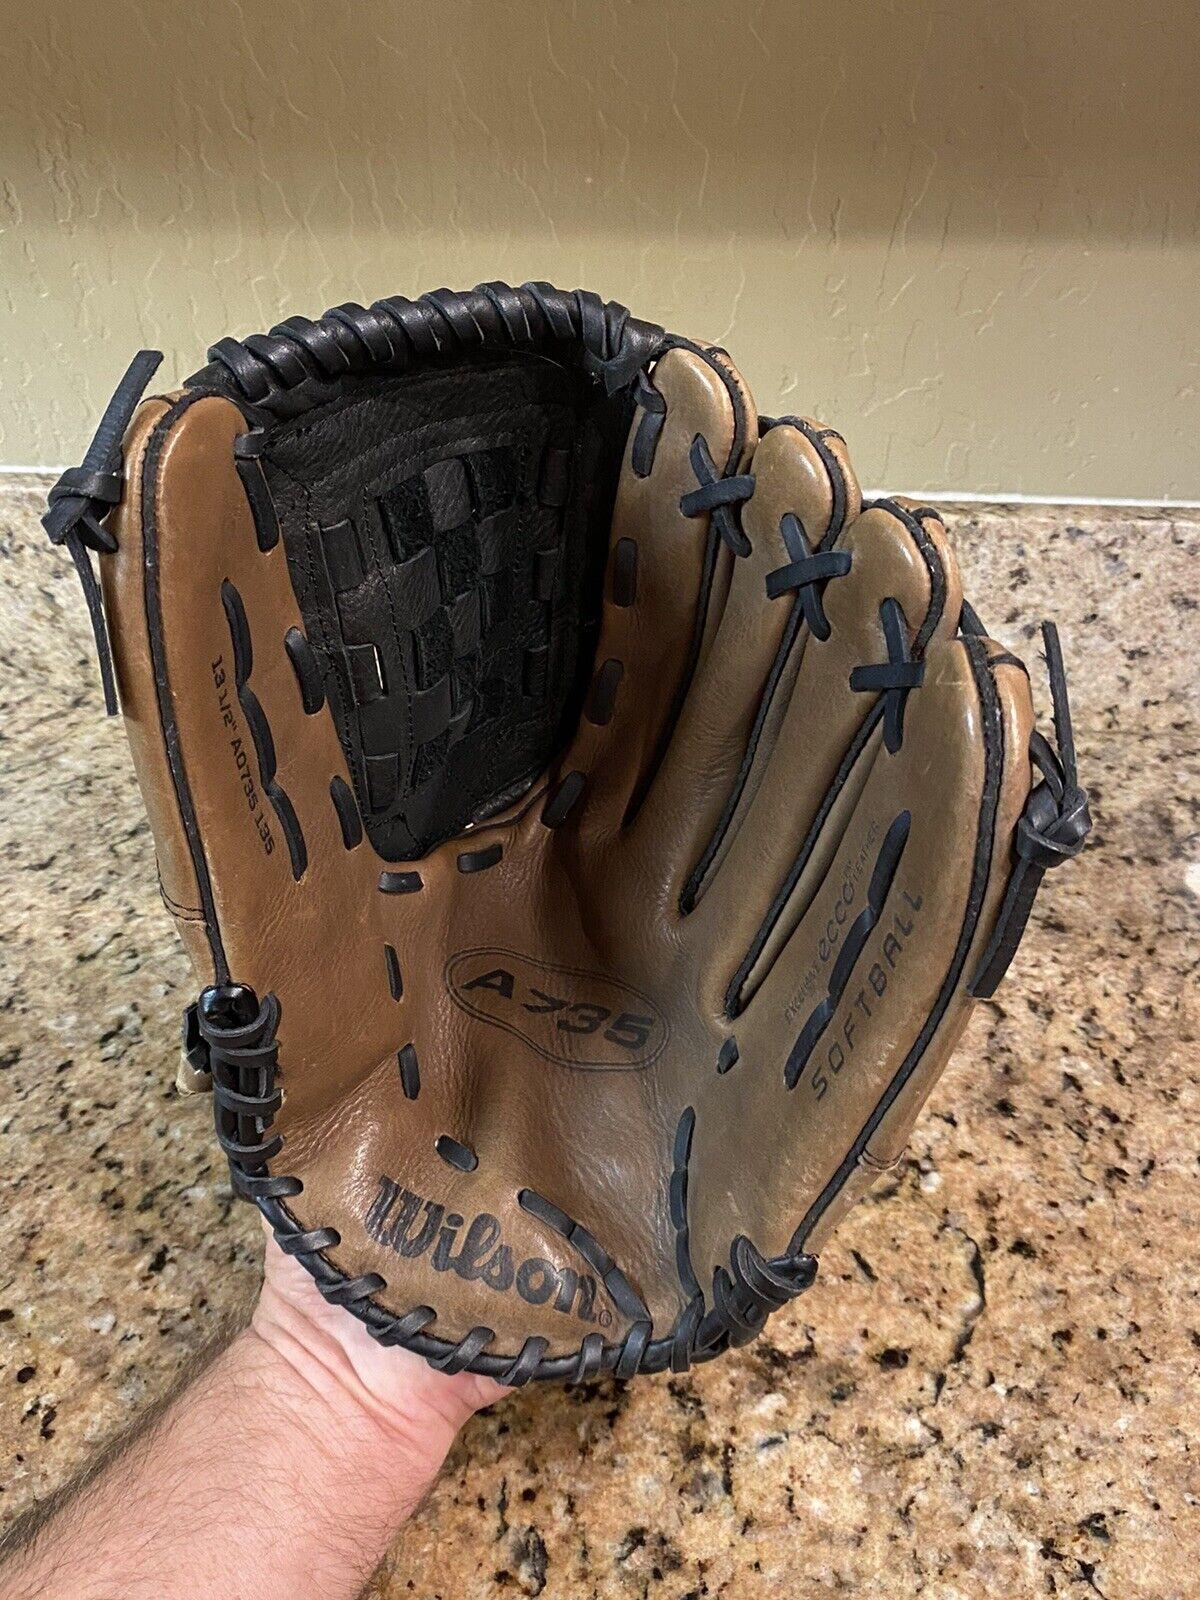 Glove Softball : glove, softball, Wilson, Carbonlite, Series, Softball, Glove, Leather, Online